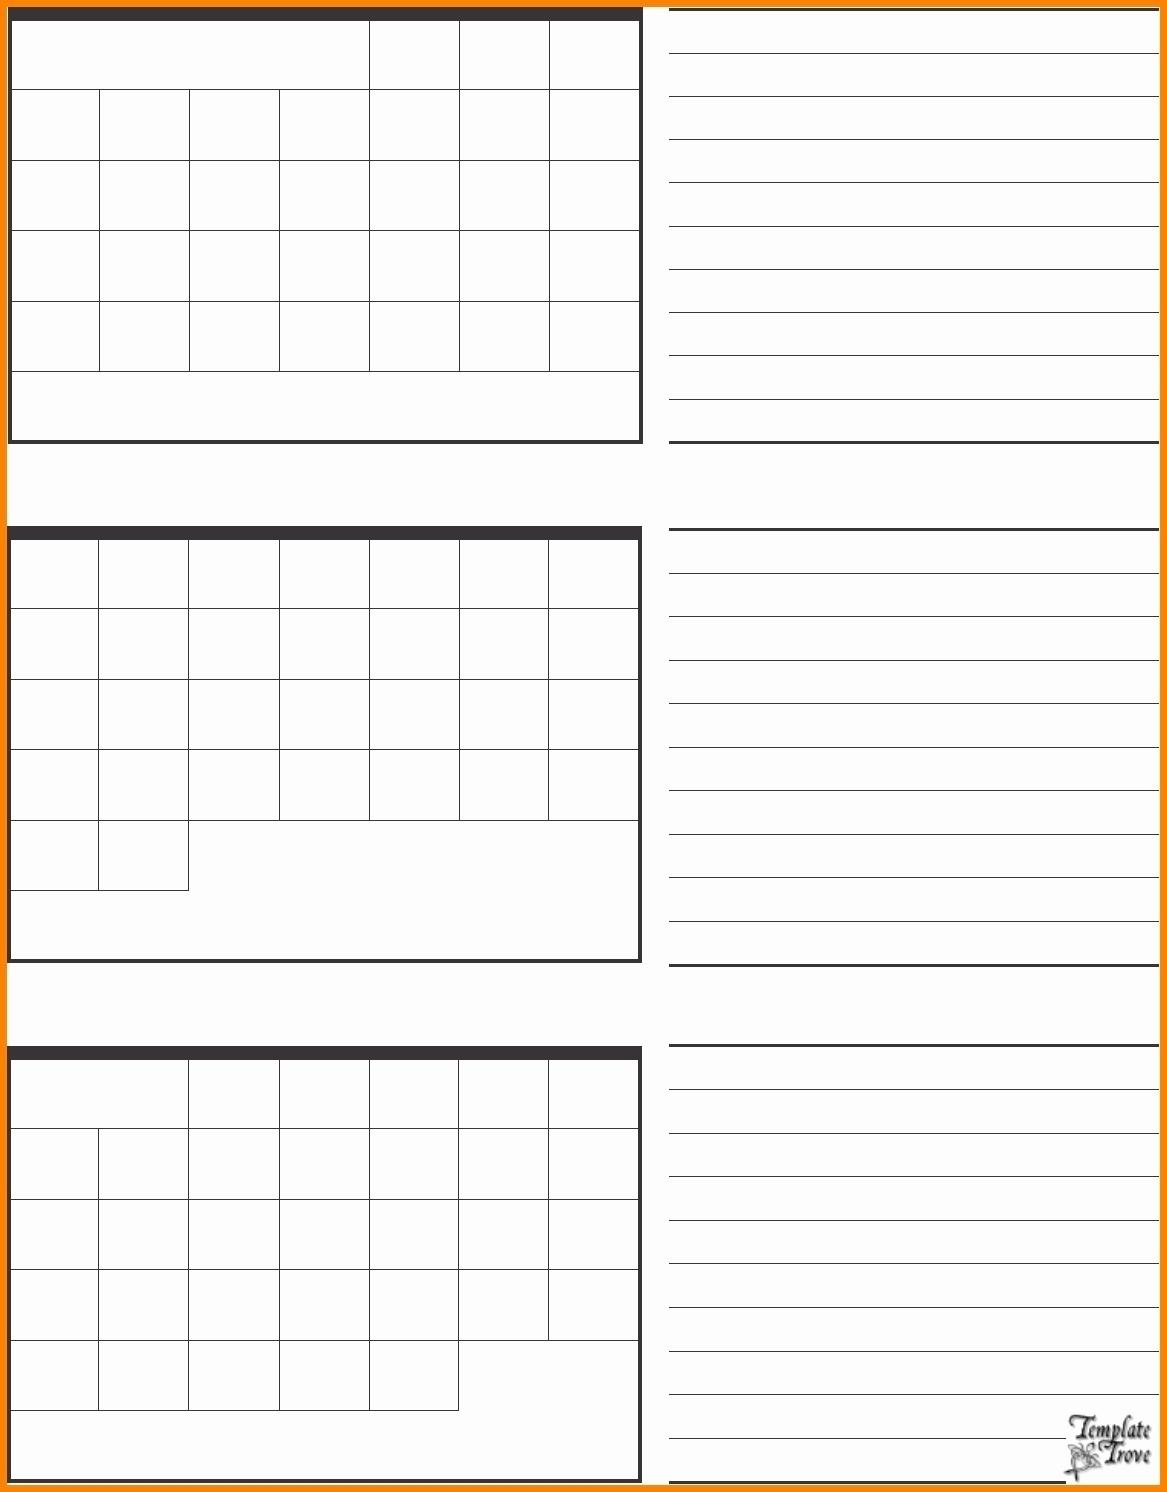 Get Printable Blank 3 Month Calendar ⋆ The Best Printable